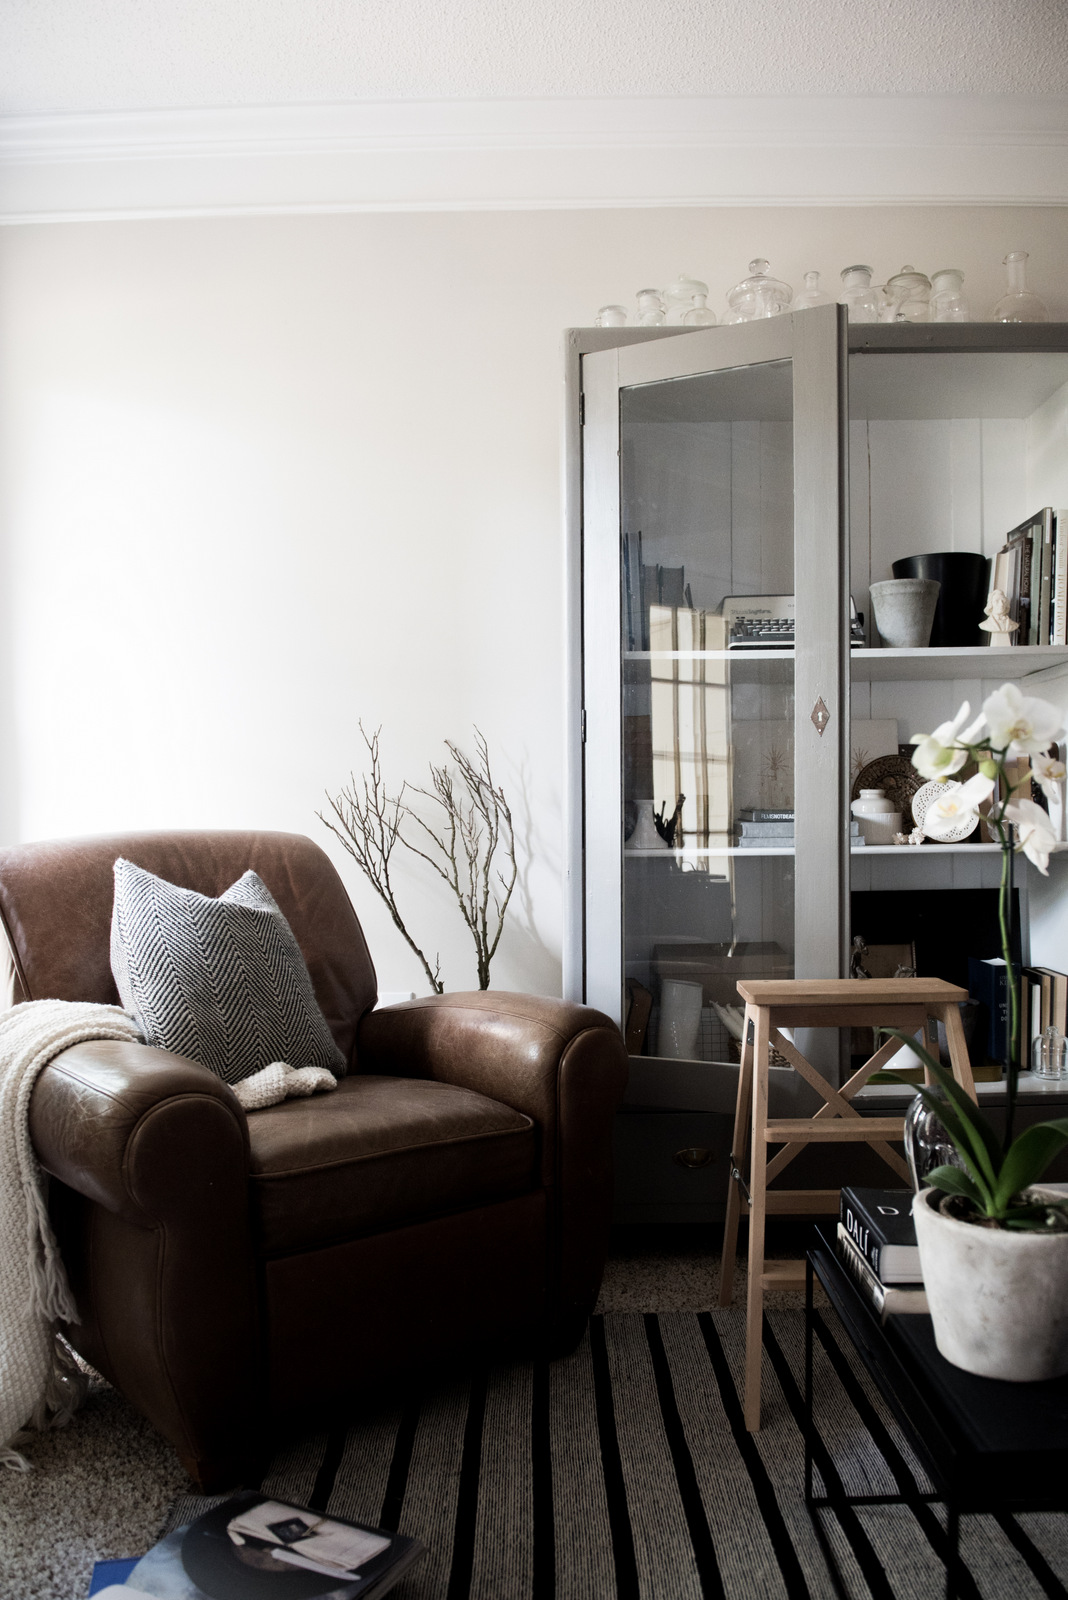 House-of-Valentina-Apartment-Valentina-Fussell.jpg